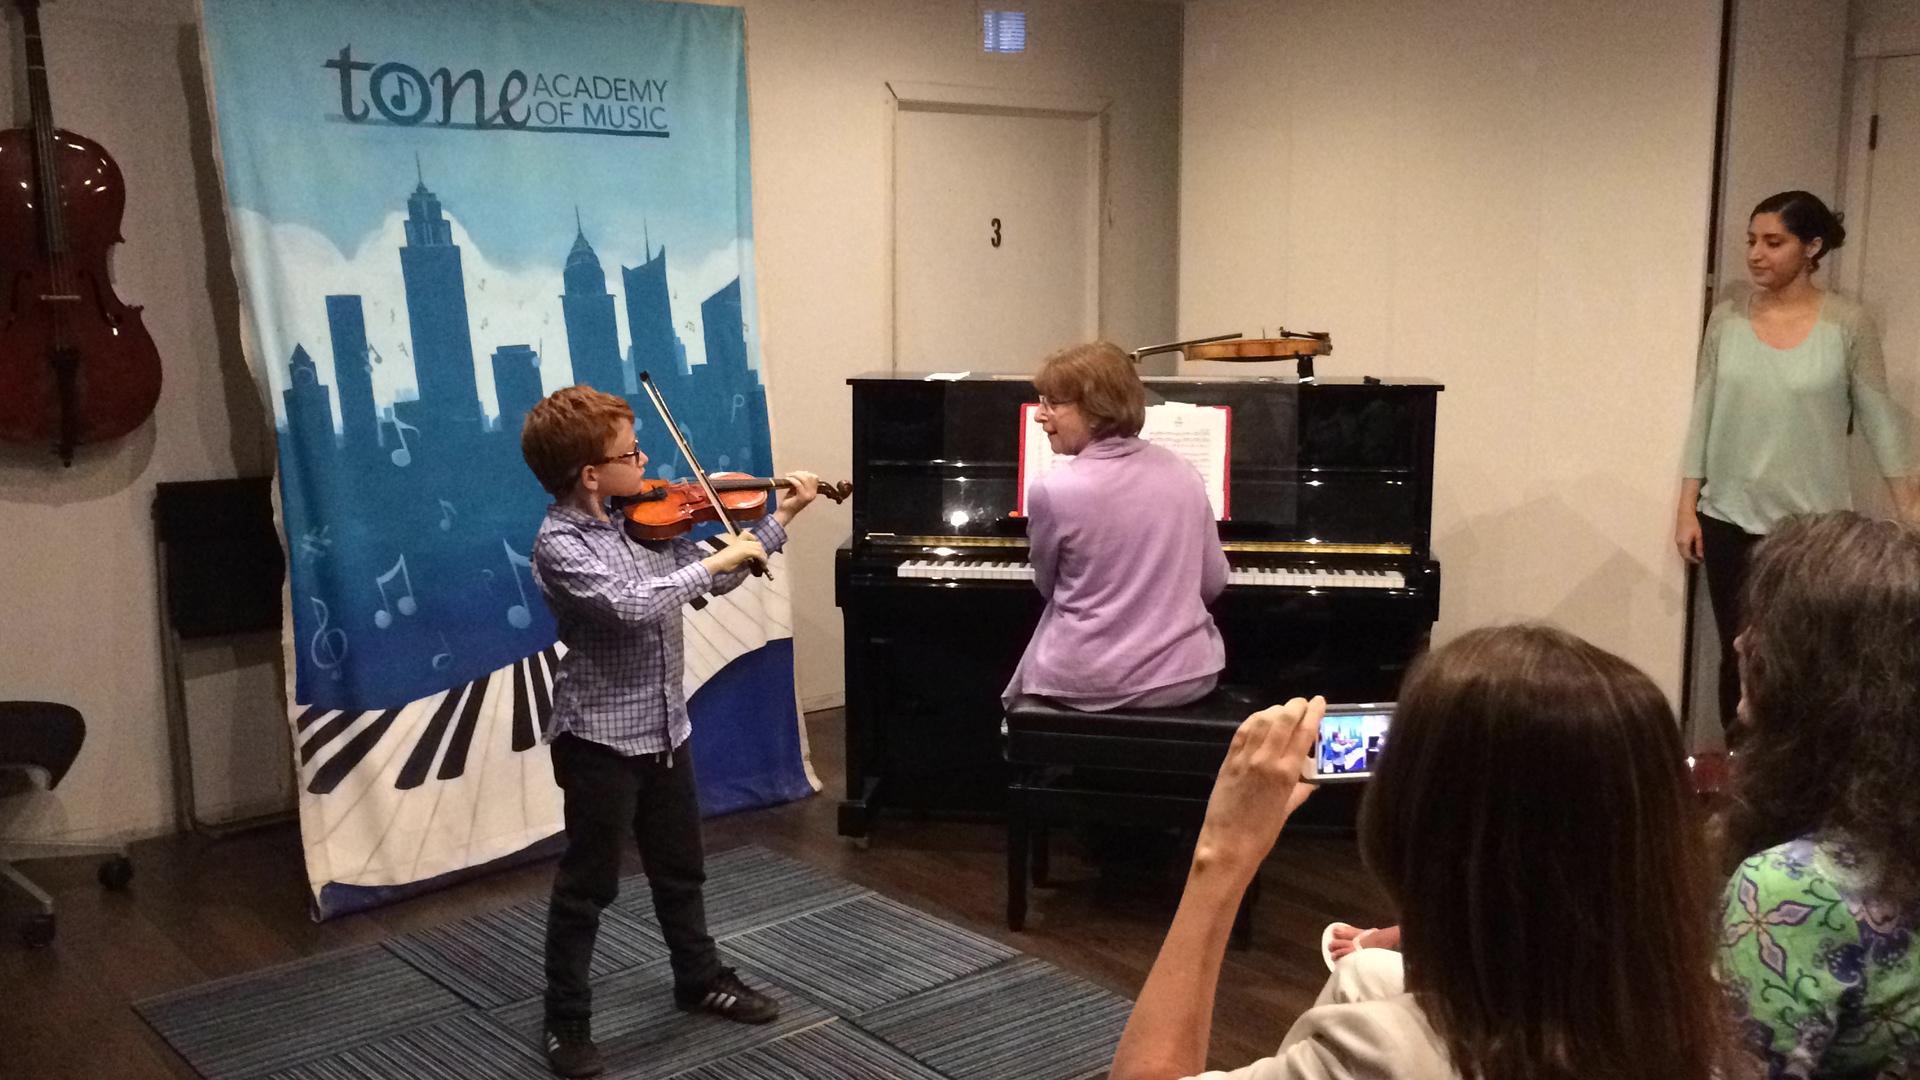 tone-academy-of-music-nyc-suzuki-violin-1.JPG